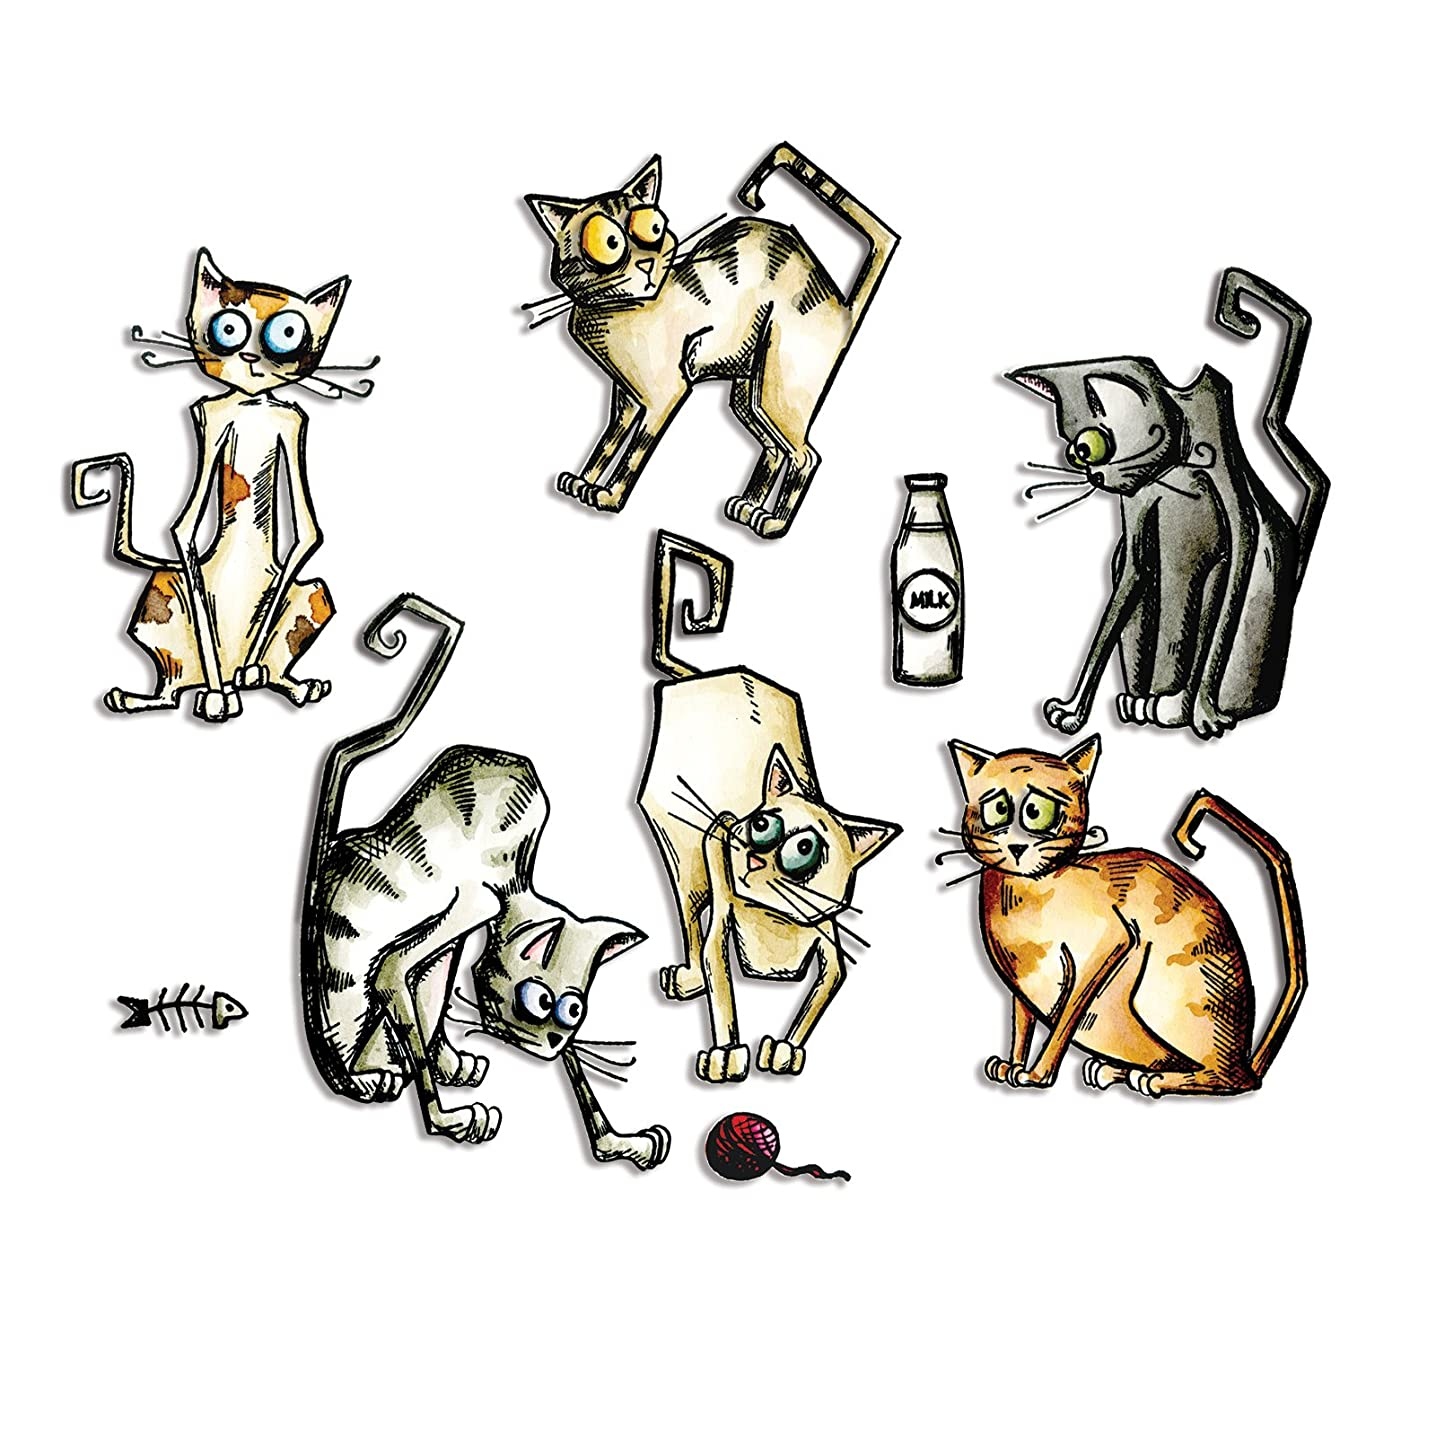 Sizzix 661209 Framelits Dies by Tim Holtz Crazy Cats